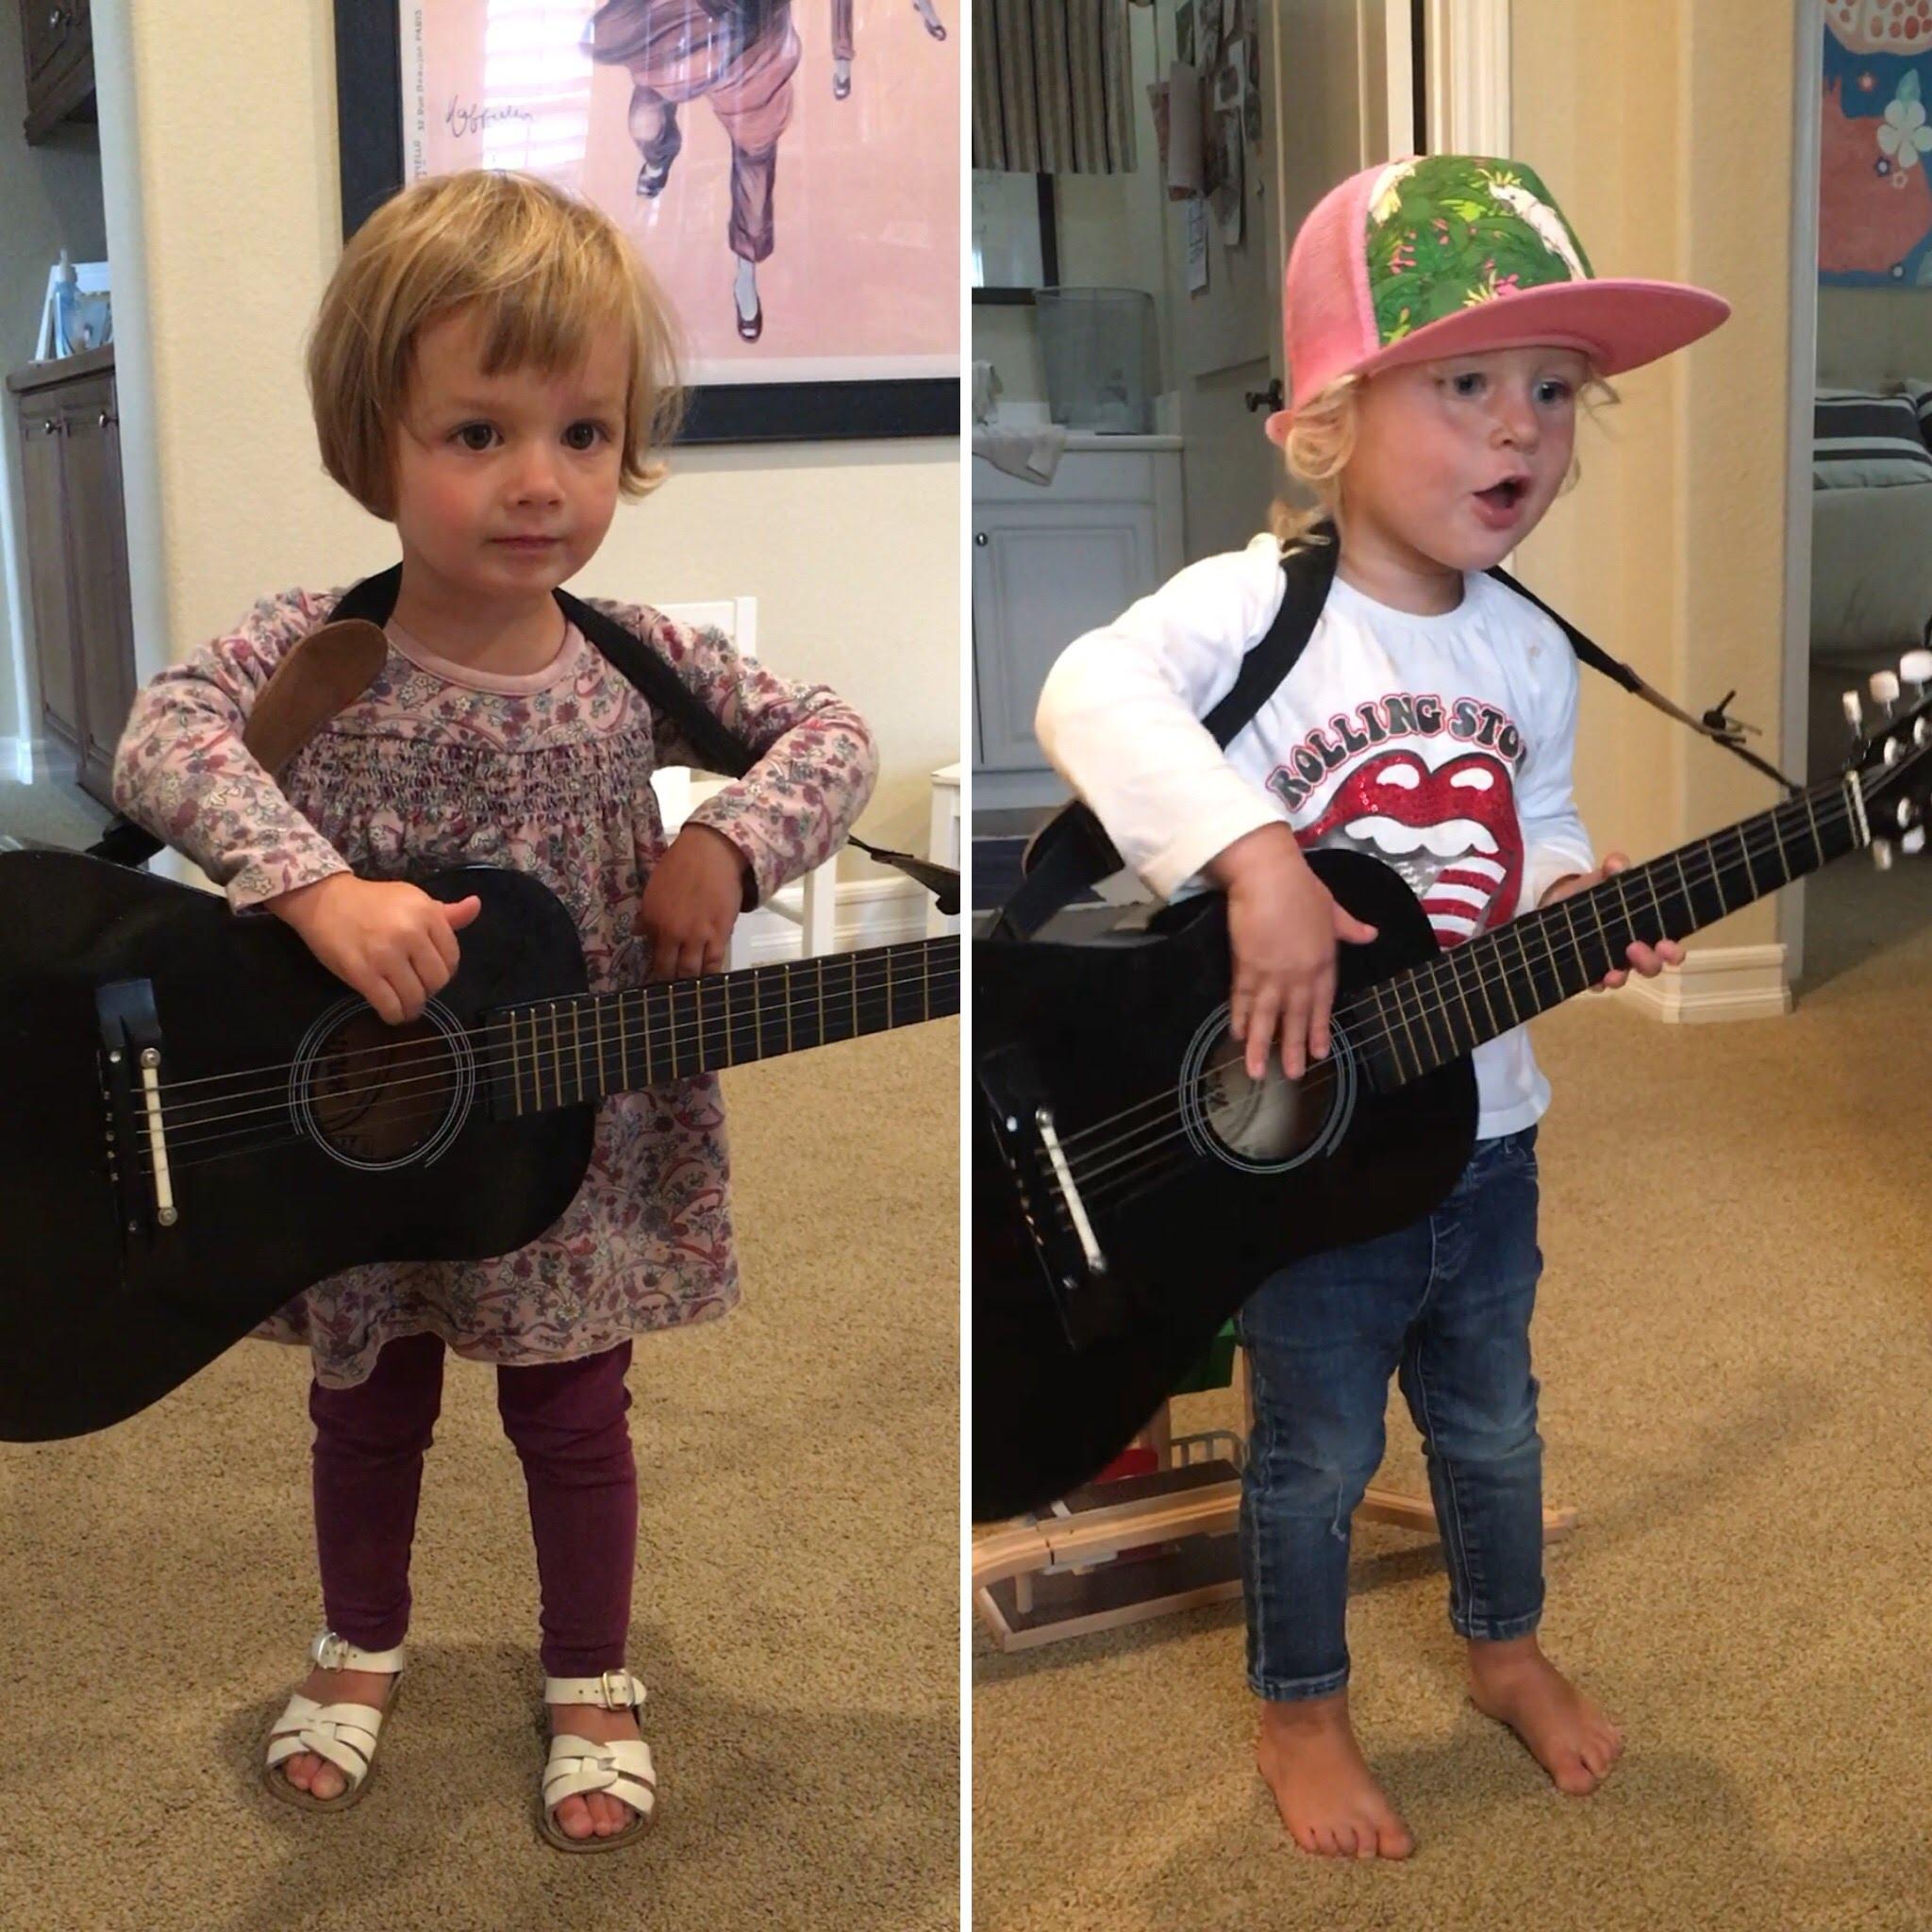 Dueling guitars: our folk singer and rocker